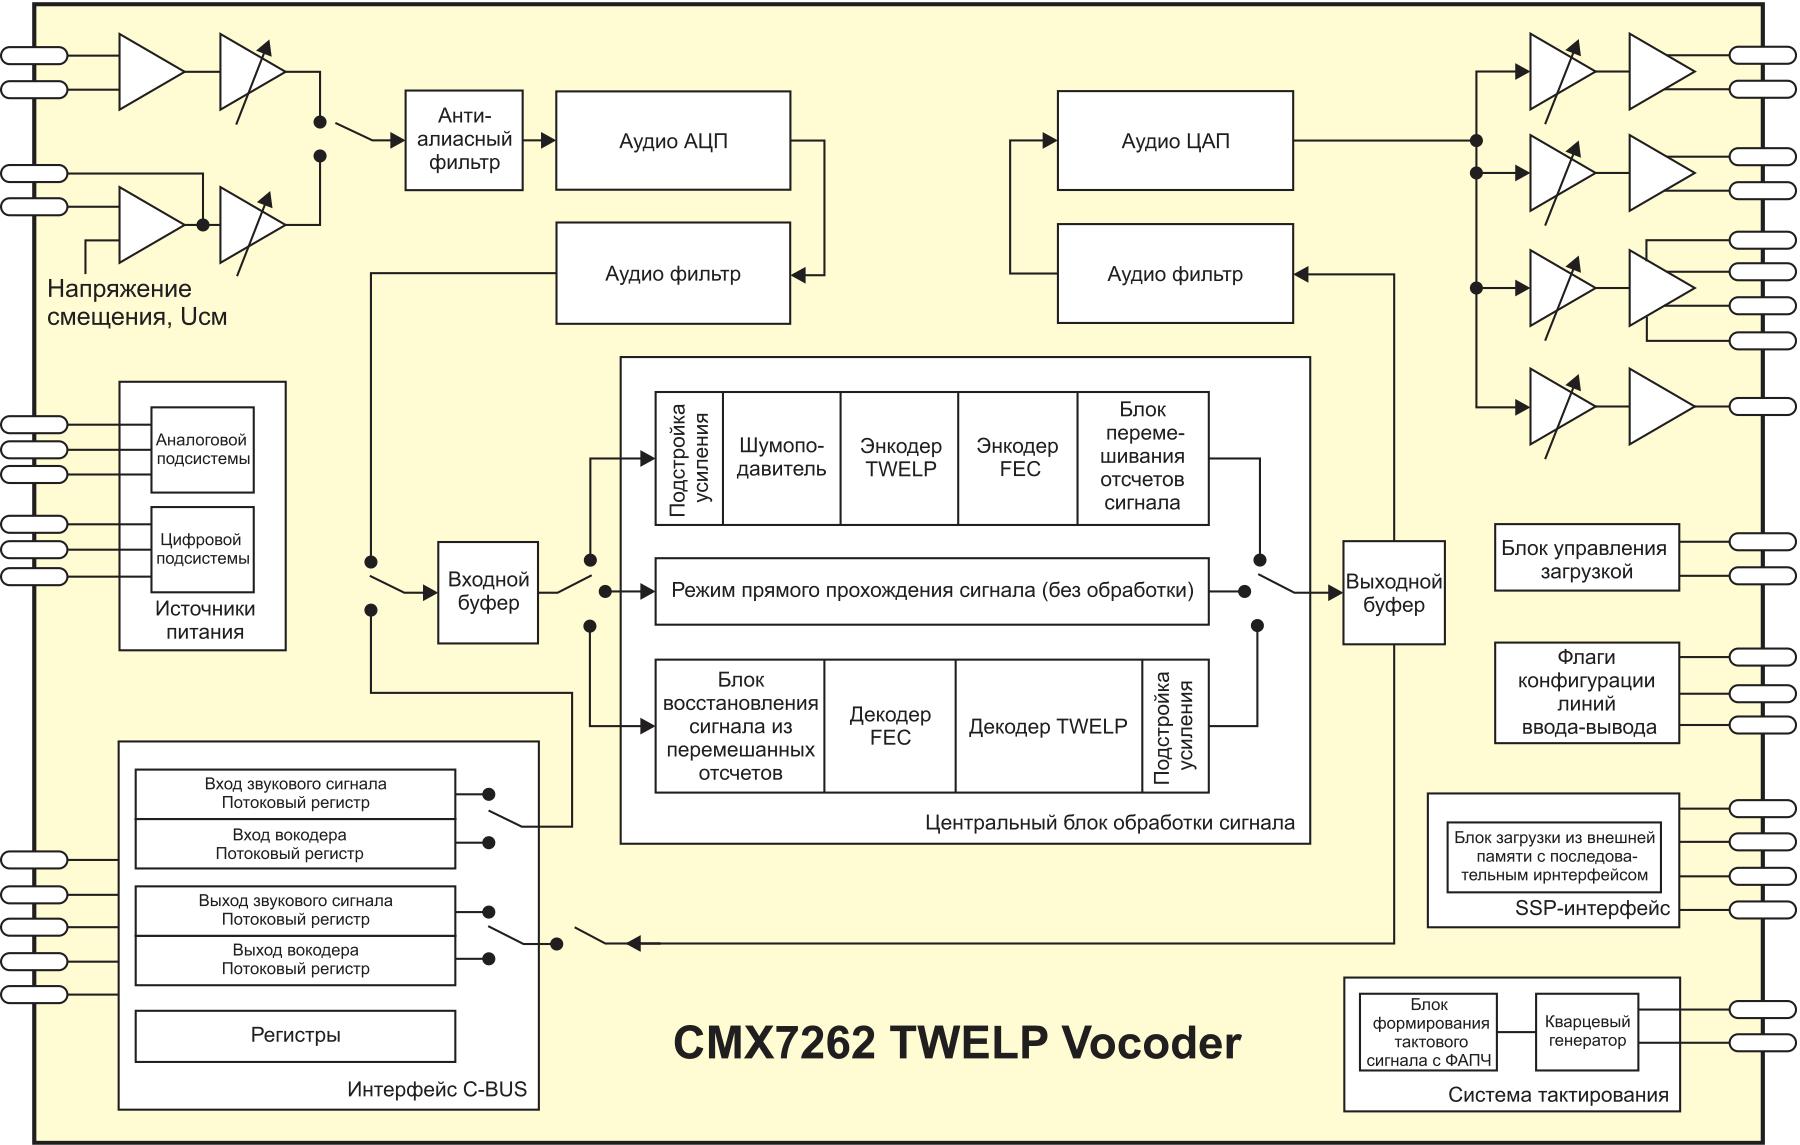 Блок-схема CMX7262